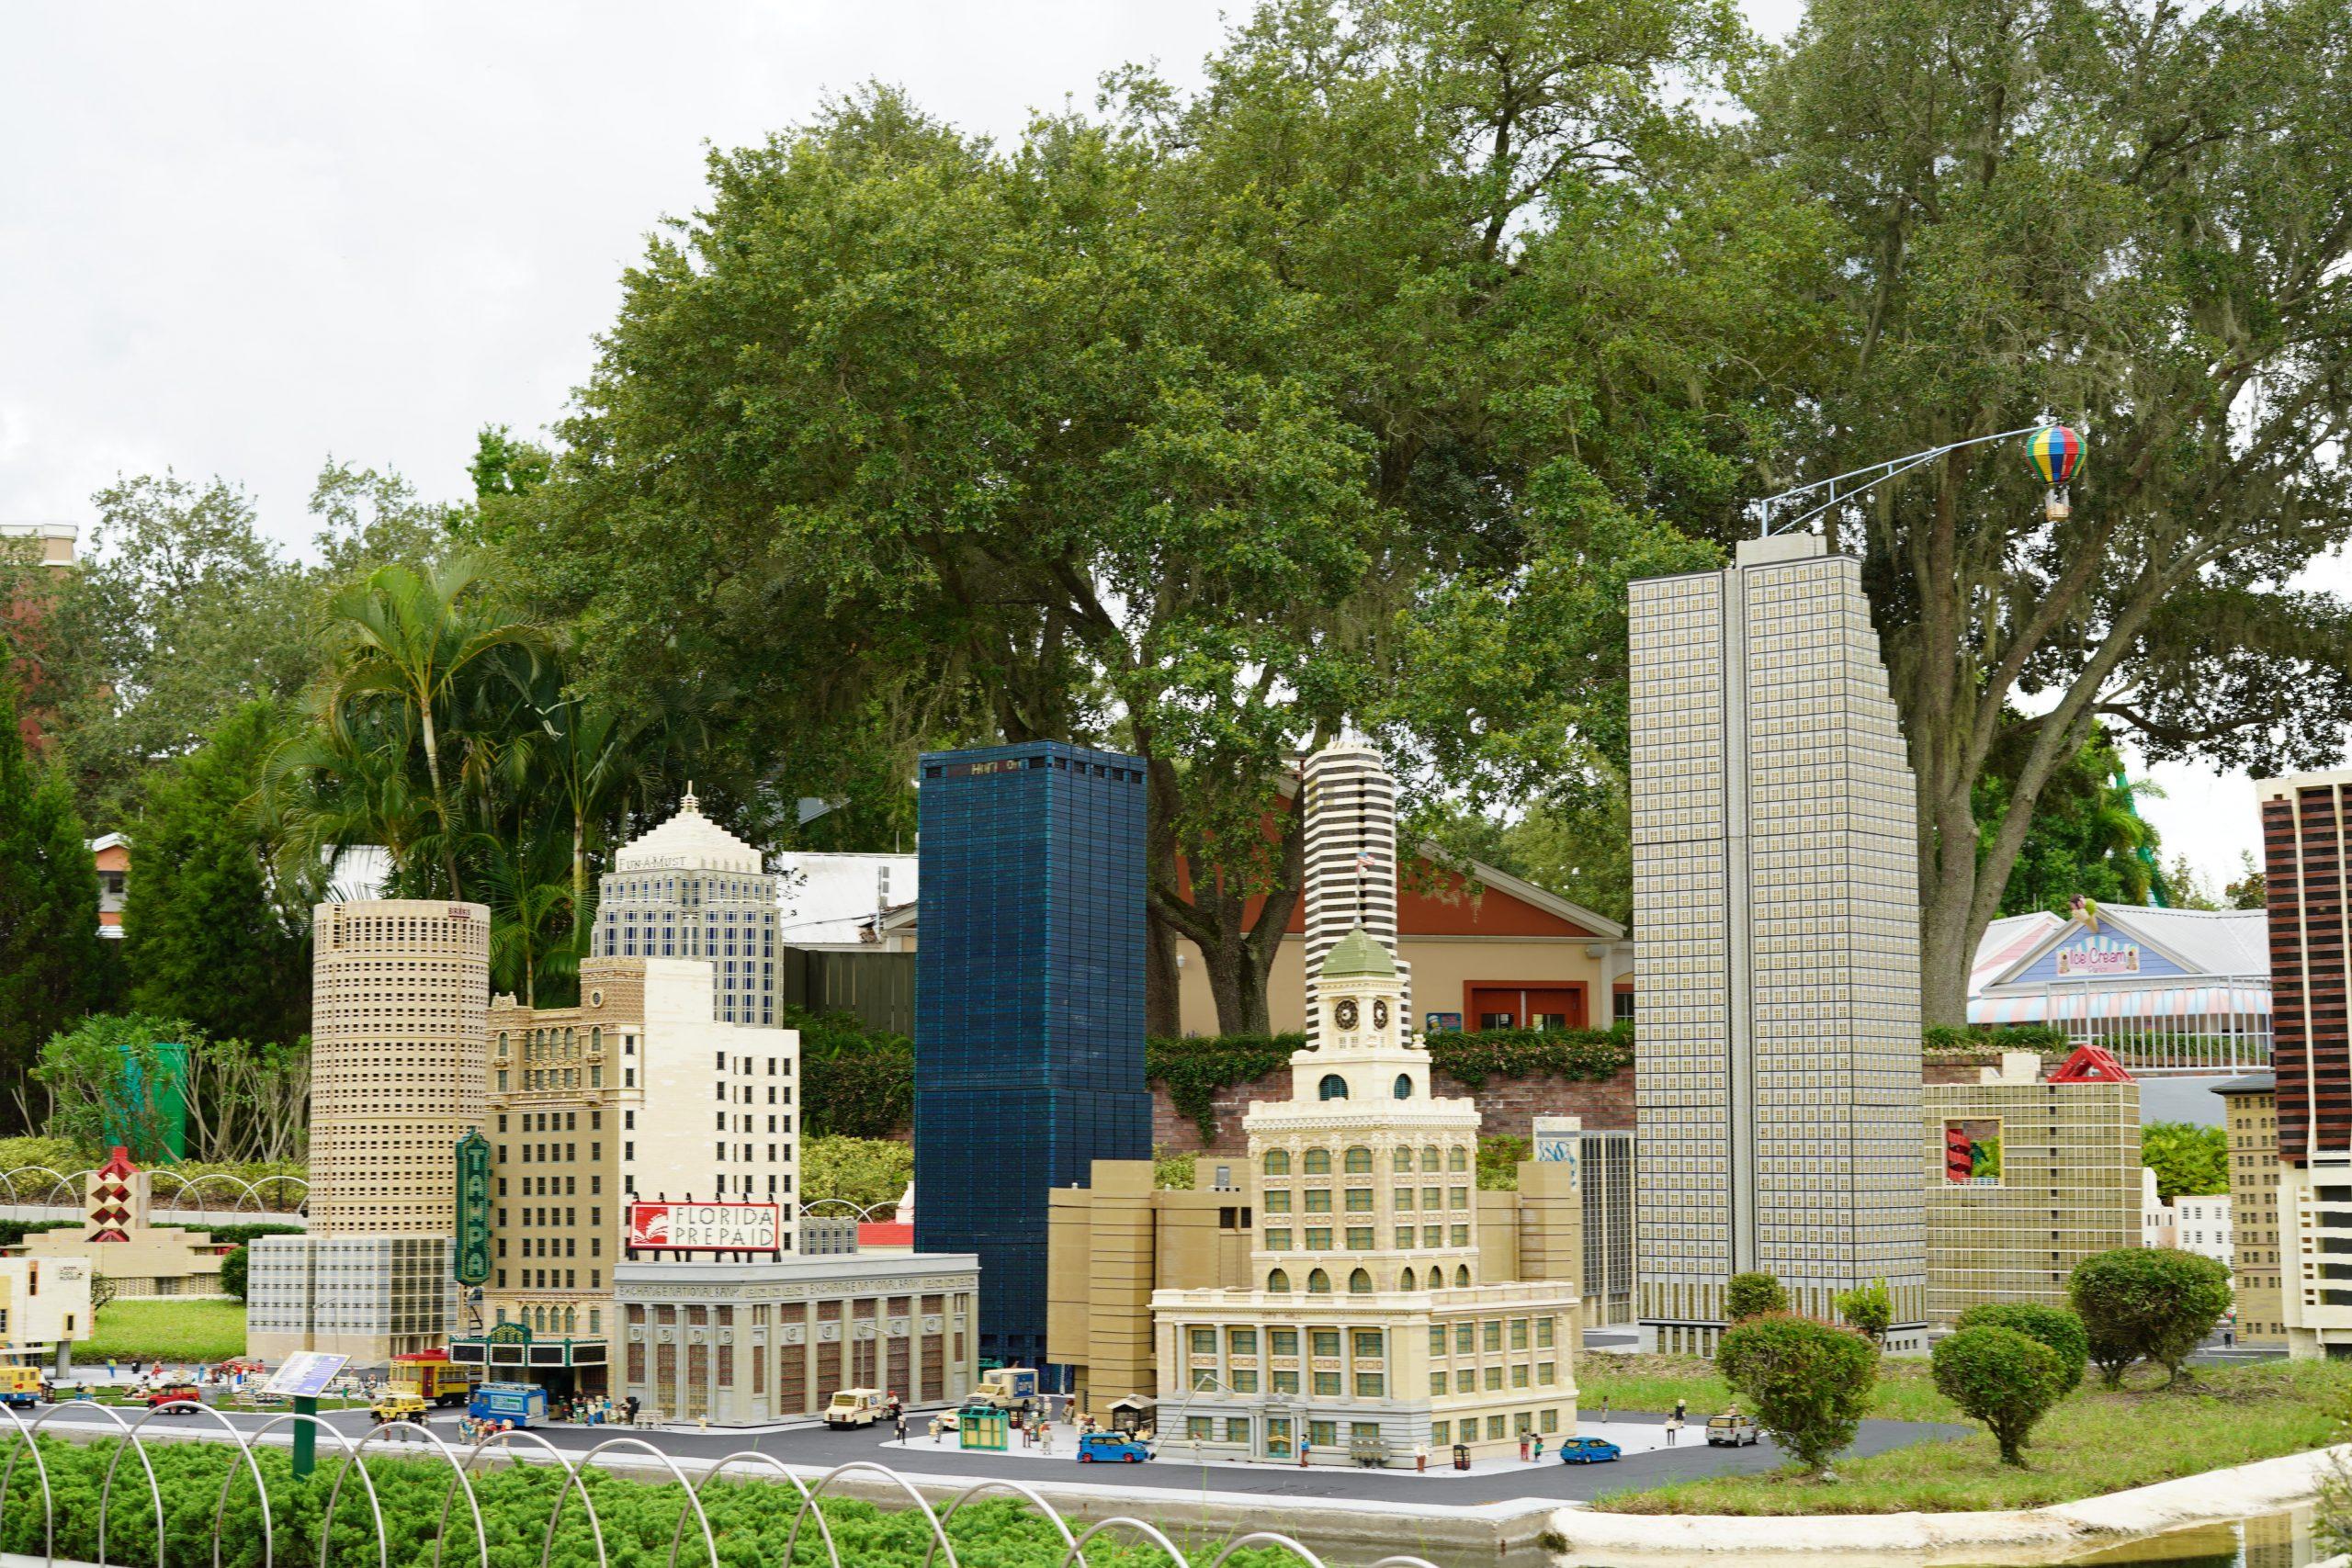 Lego city of Tampa in Miniland in LEGOLAND.  | Guide to LEGOLAND Florida